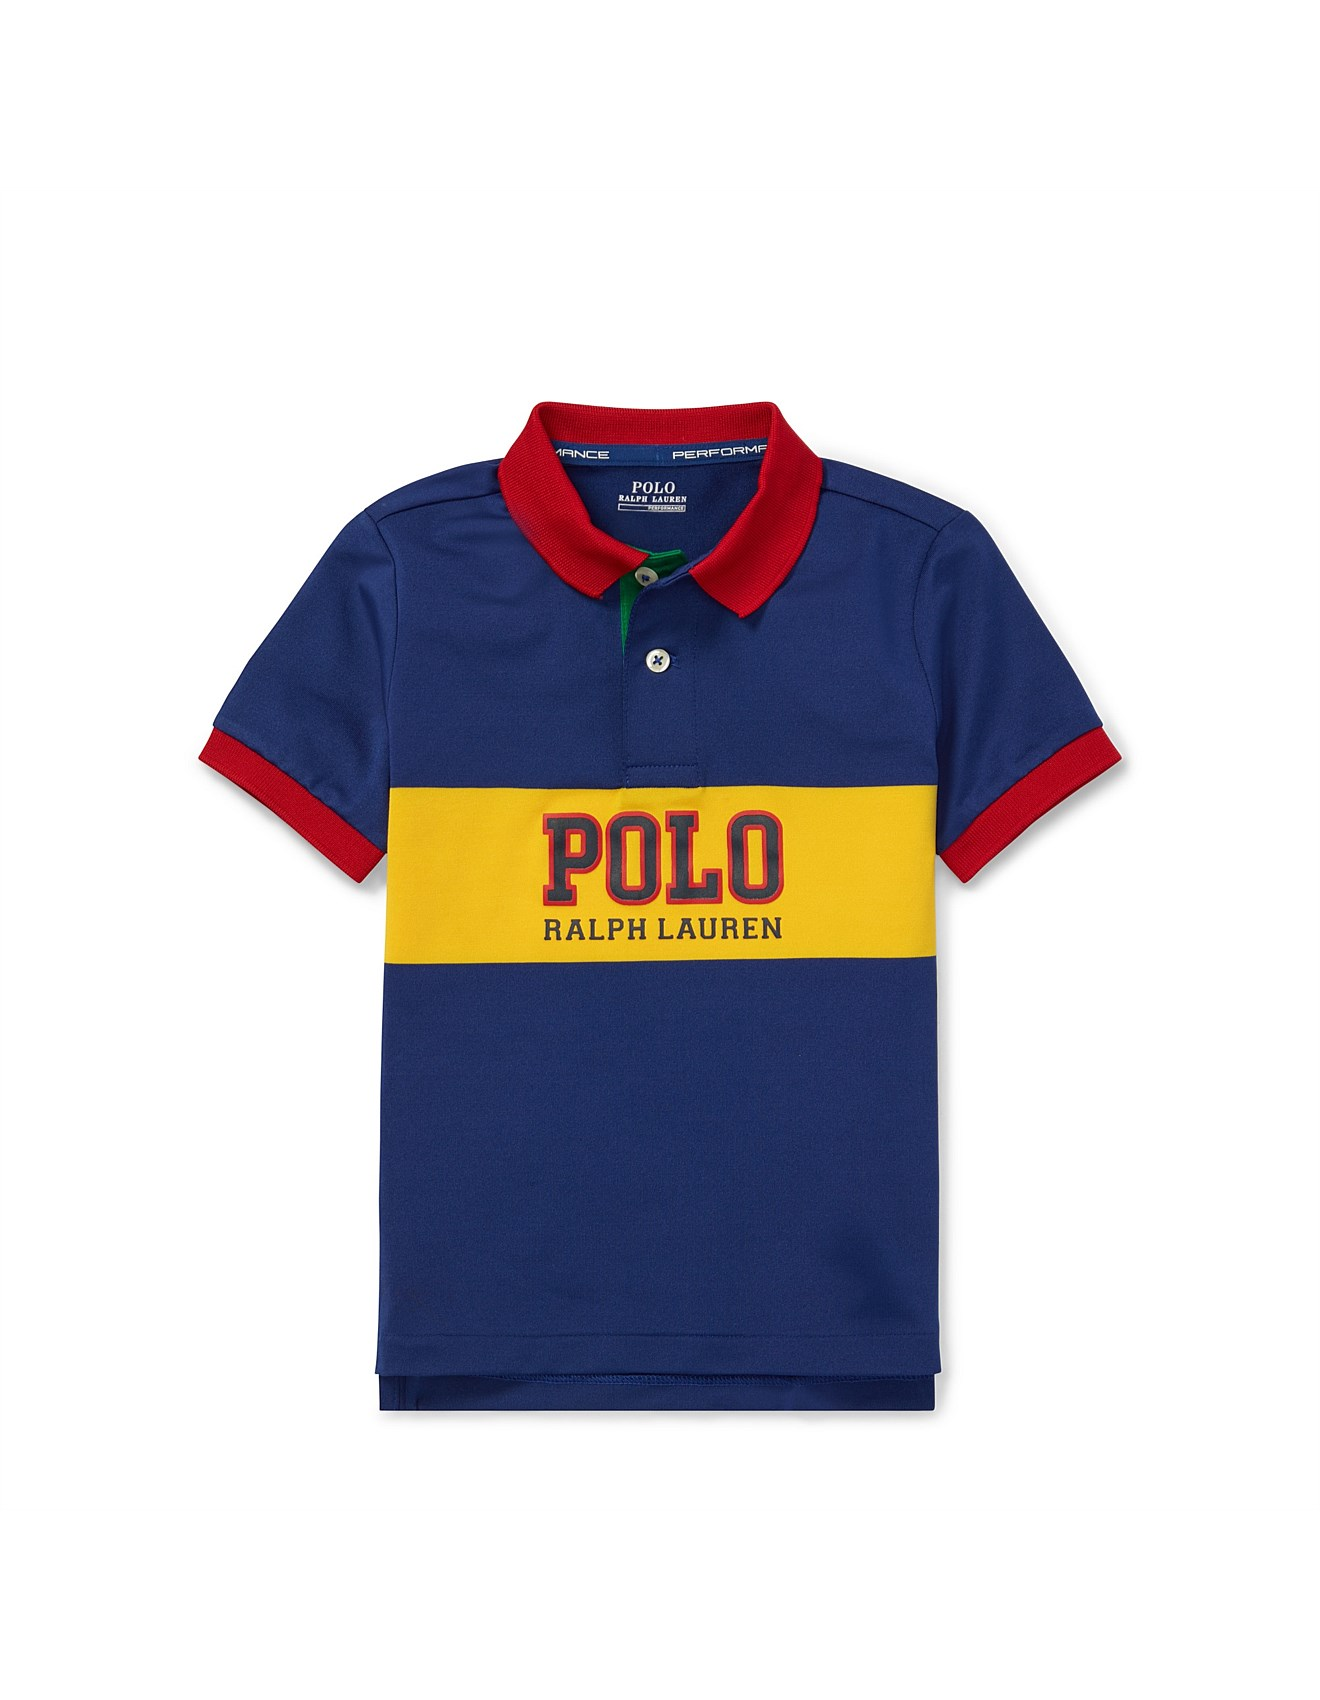 Polo 7 Years Performance Shirt4 WrCEdxBQoe